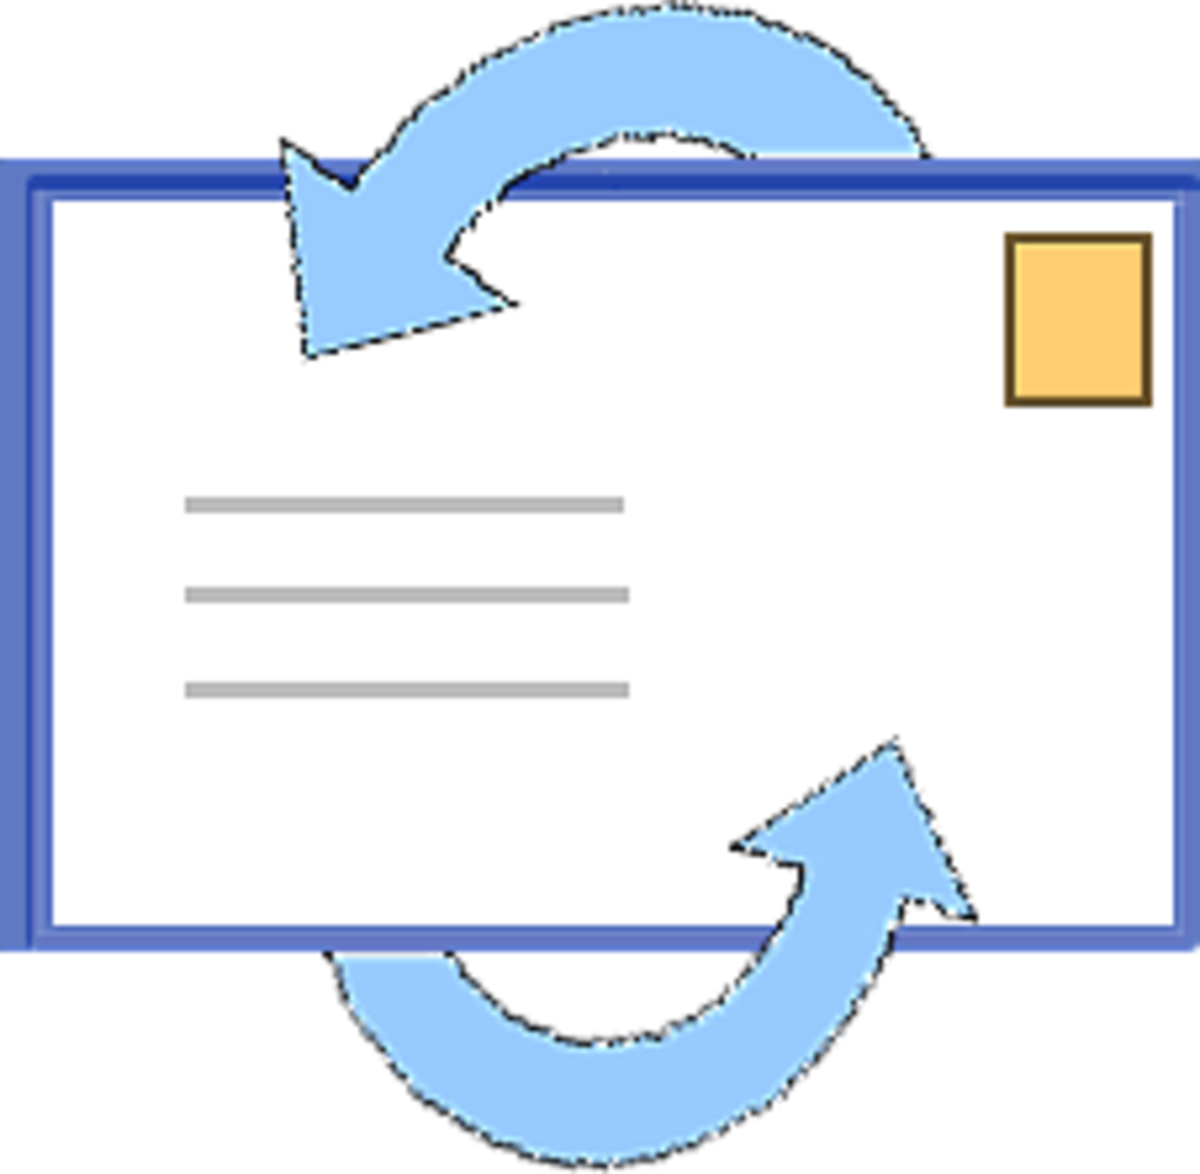 Outlook Express, an email program